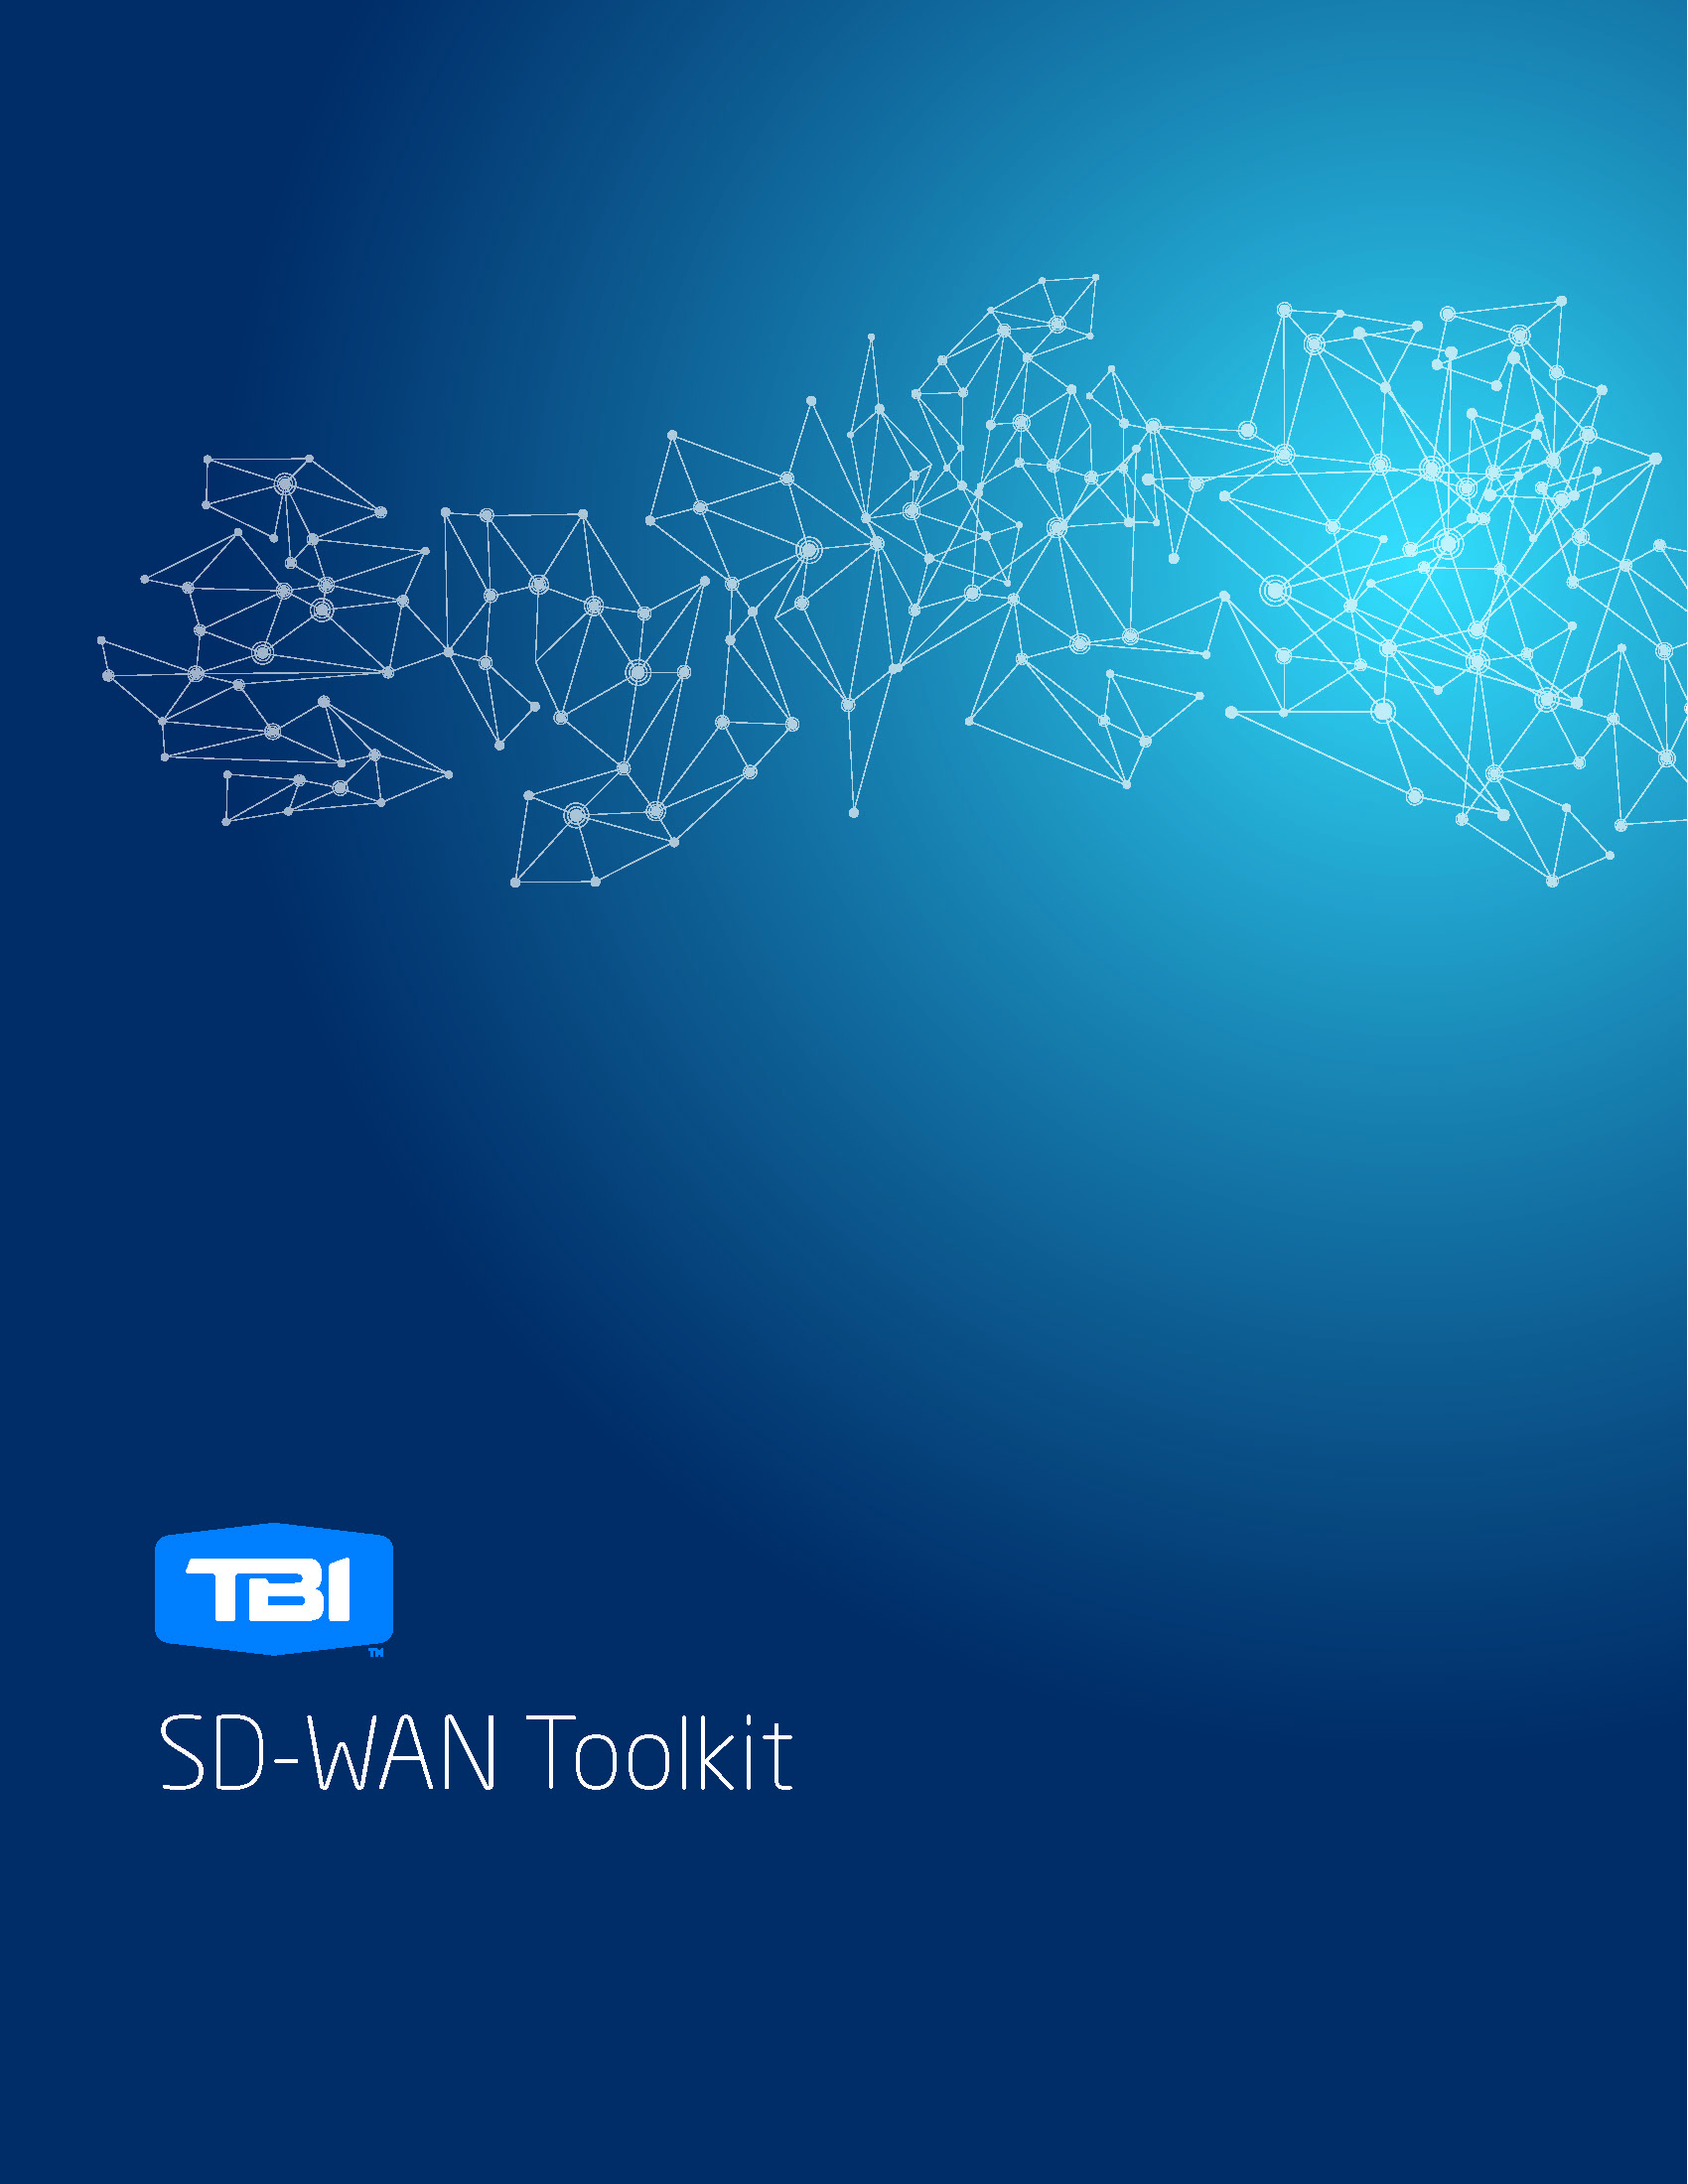 SD-WAN-TOOL-KIT_2019_1-4_B_Page_01